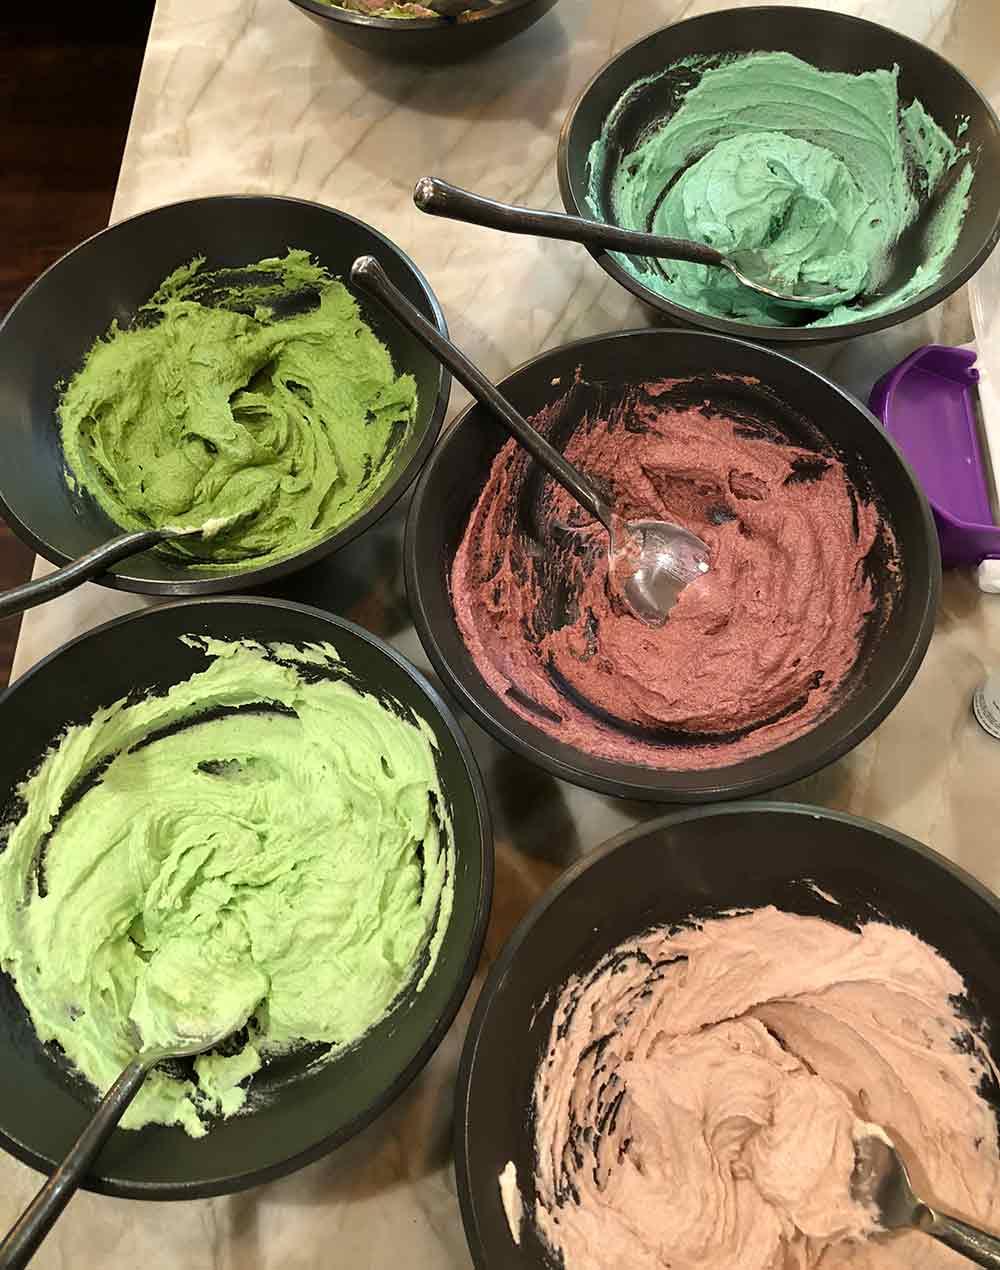 vegan buttercream frosting for making succulent plants